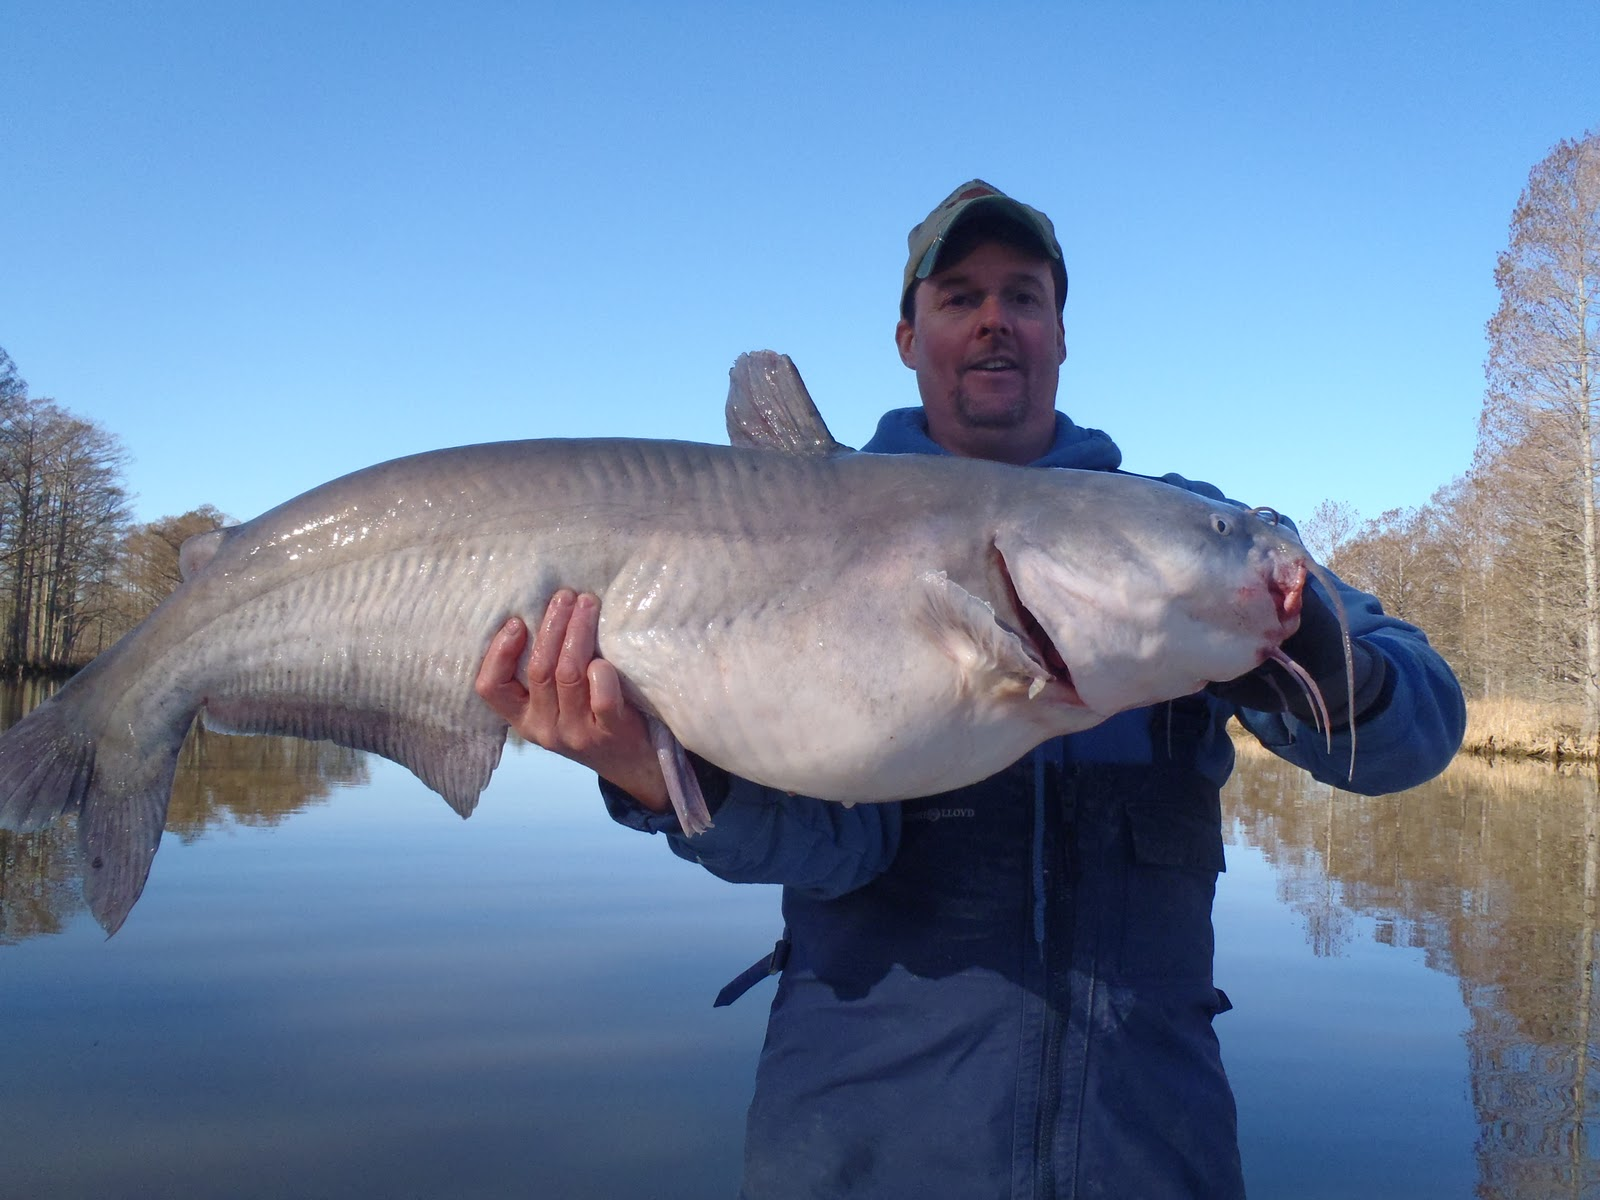 Fishing the chesapeake river monsters james river catfish for James river fishing